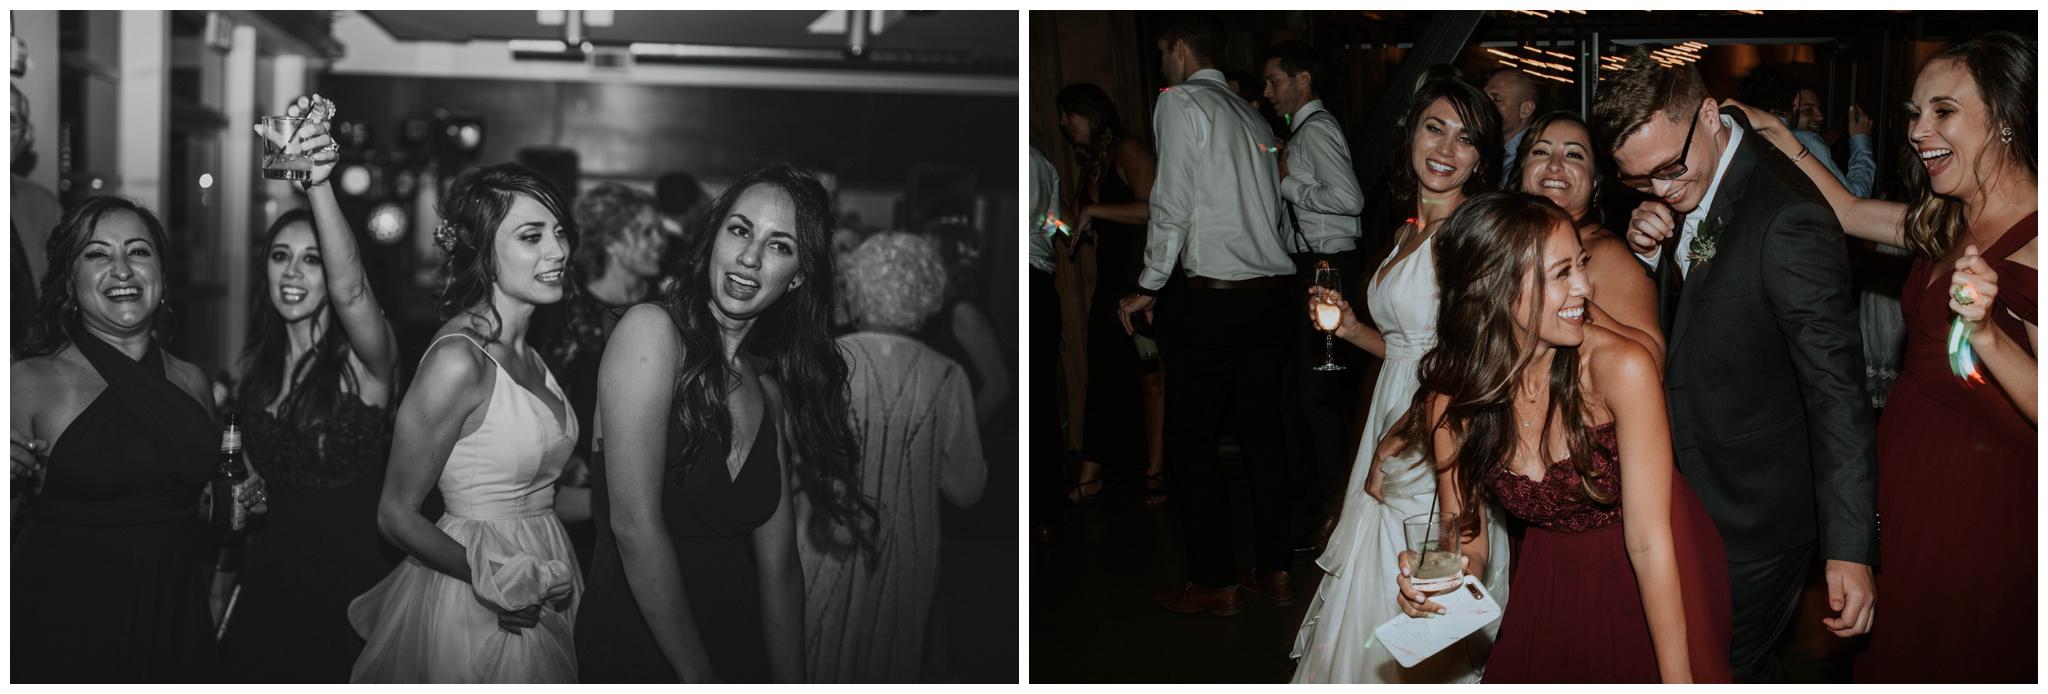 alyssa-keiran-westland-distillery-urban-seattle-wedding-photographer-caitlyn-nikula-156.jpg